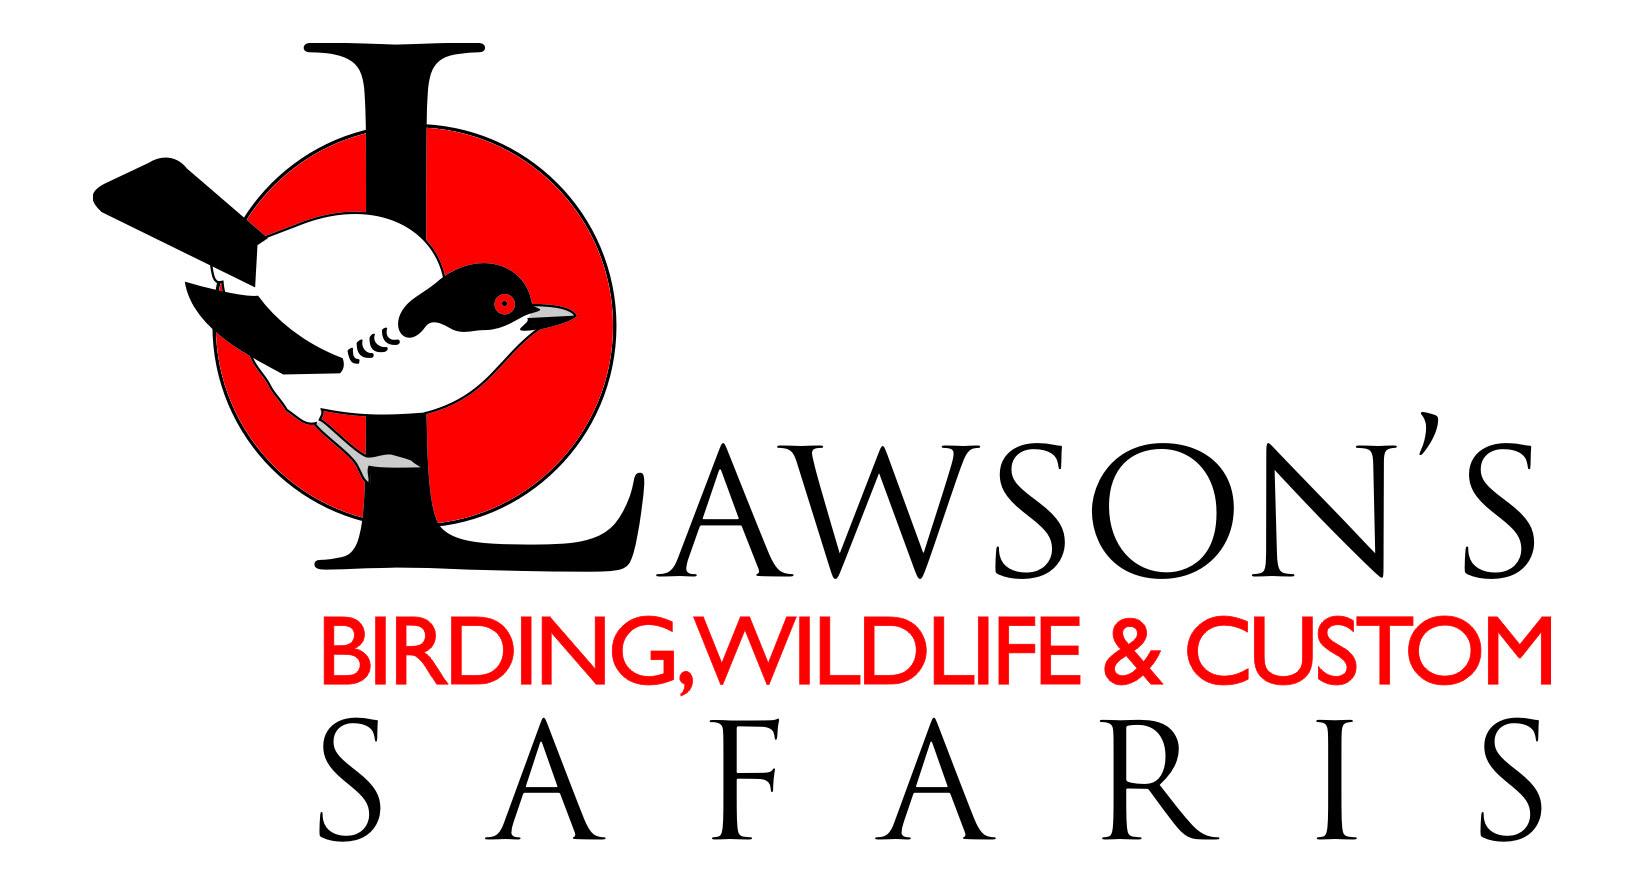 Lawson's Birding and Wildlife Safaris